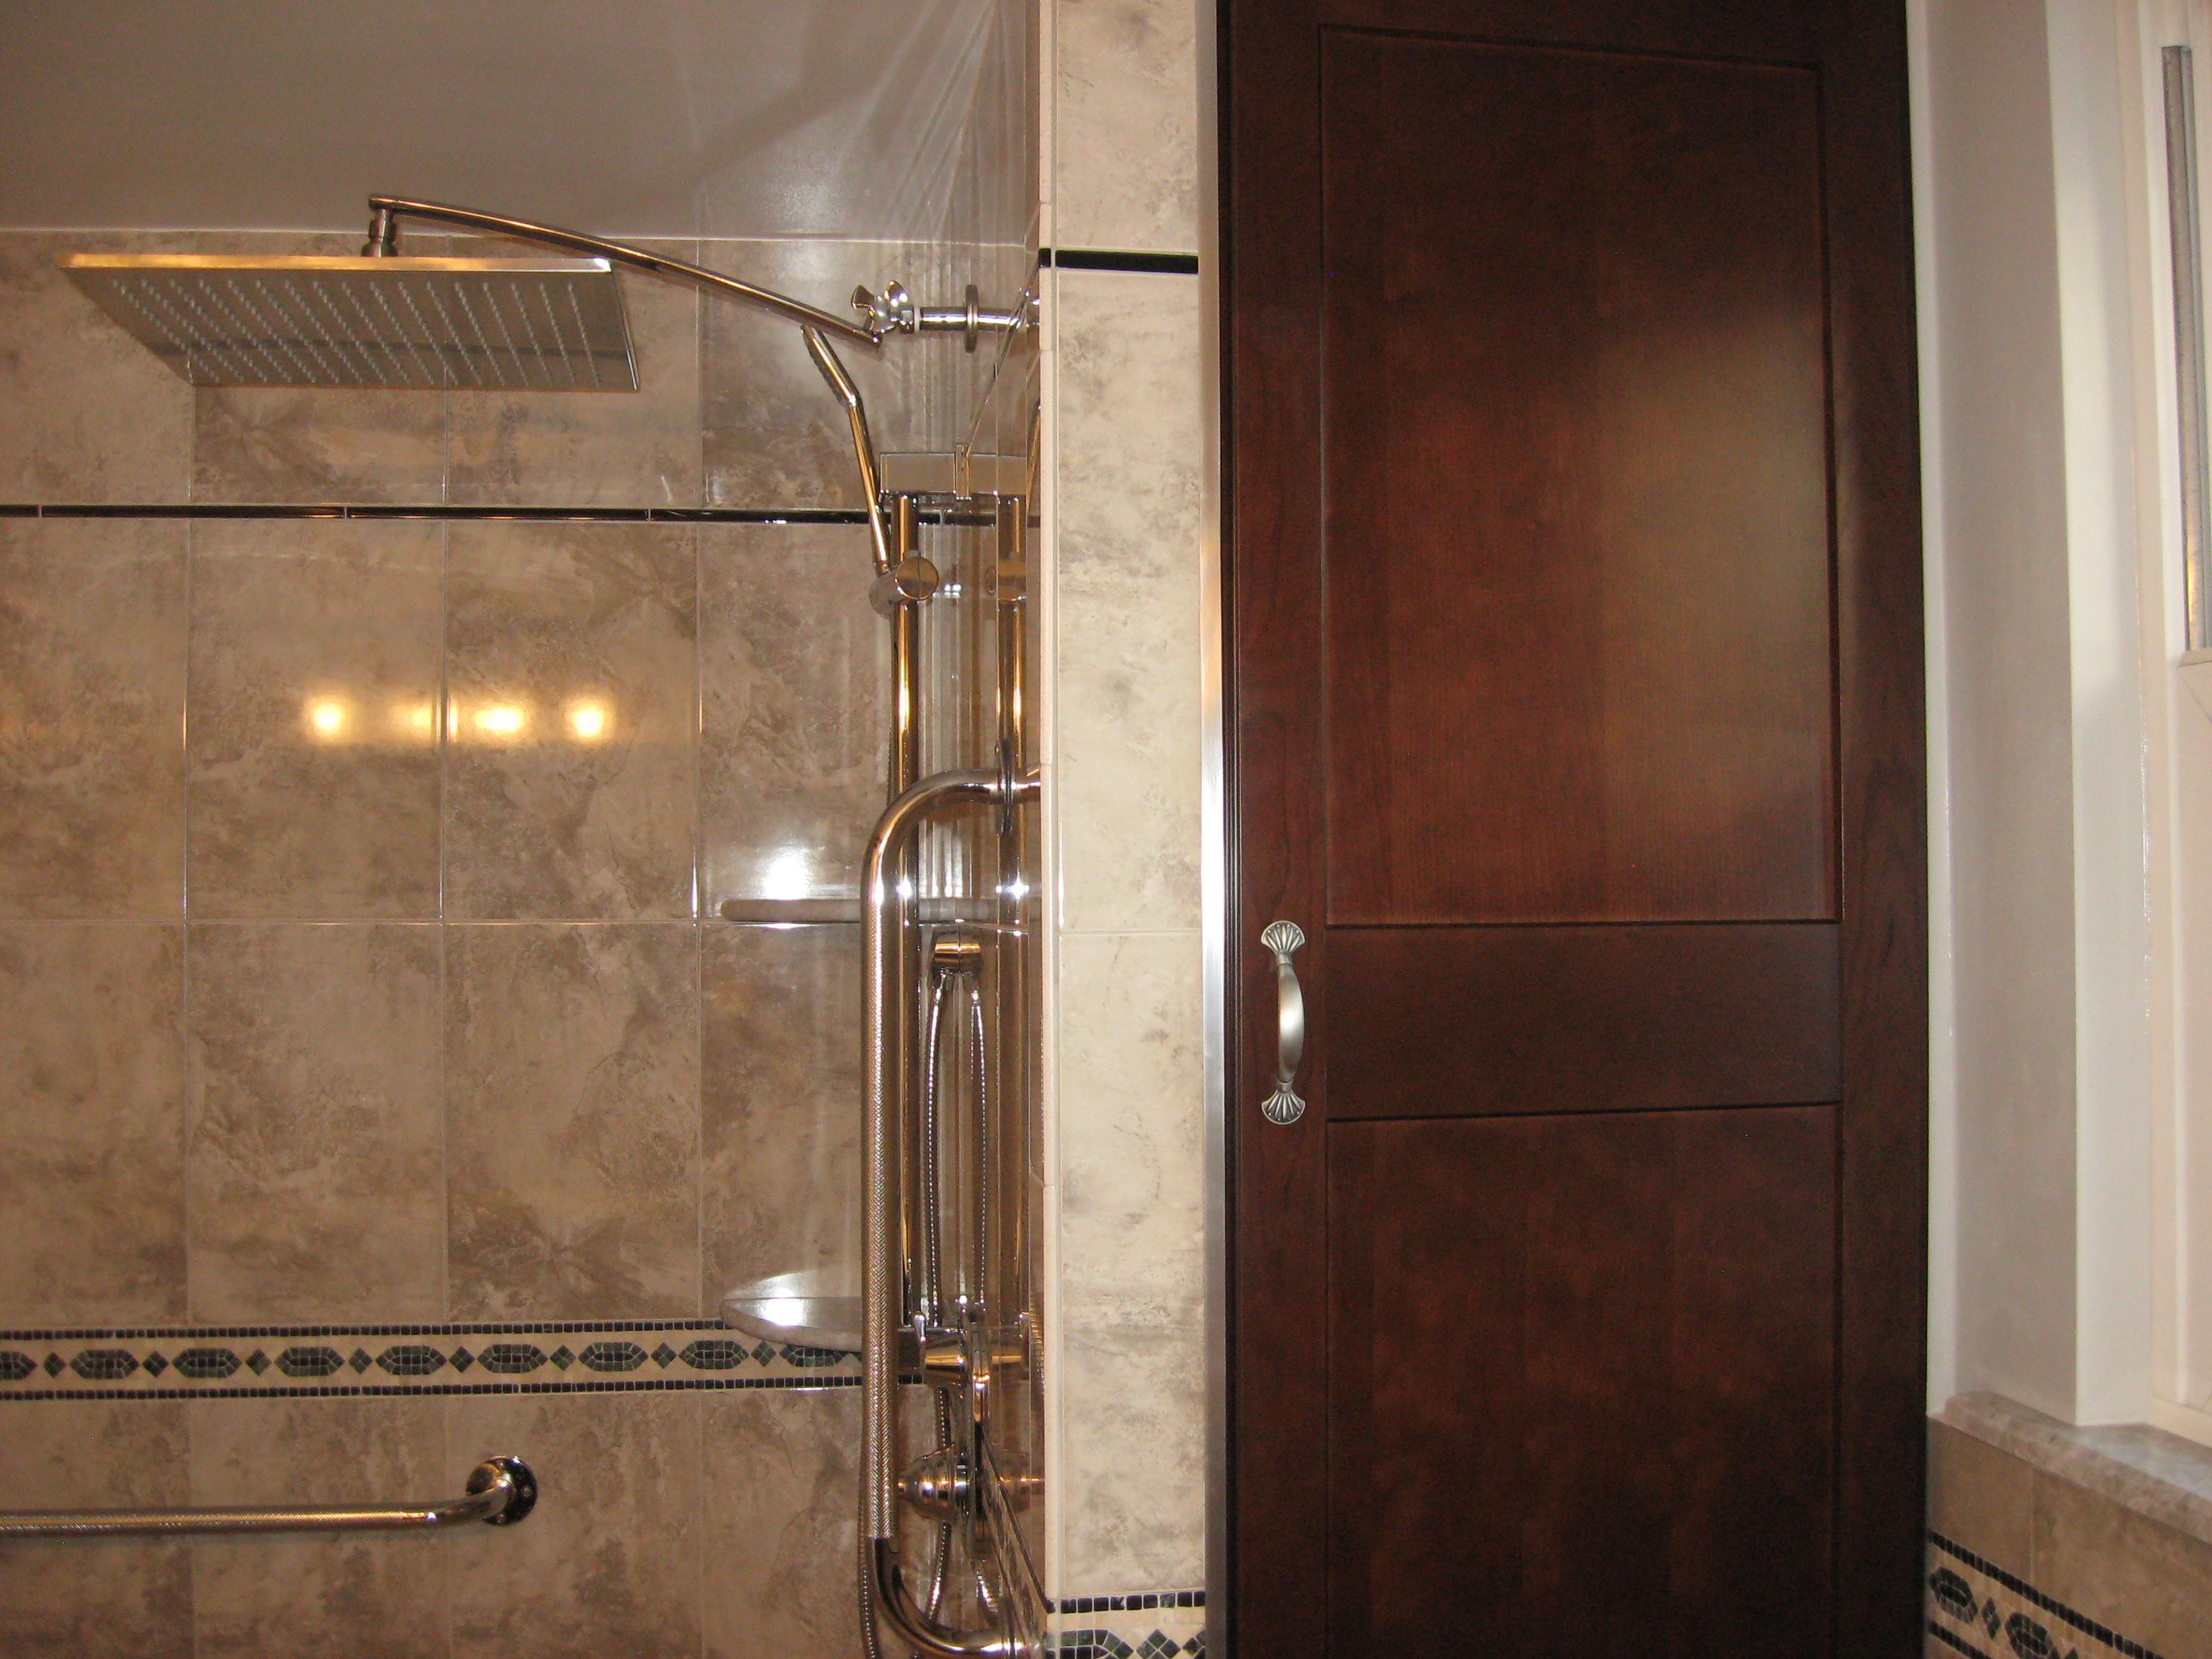 New bathroom-img_1423.jpg